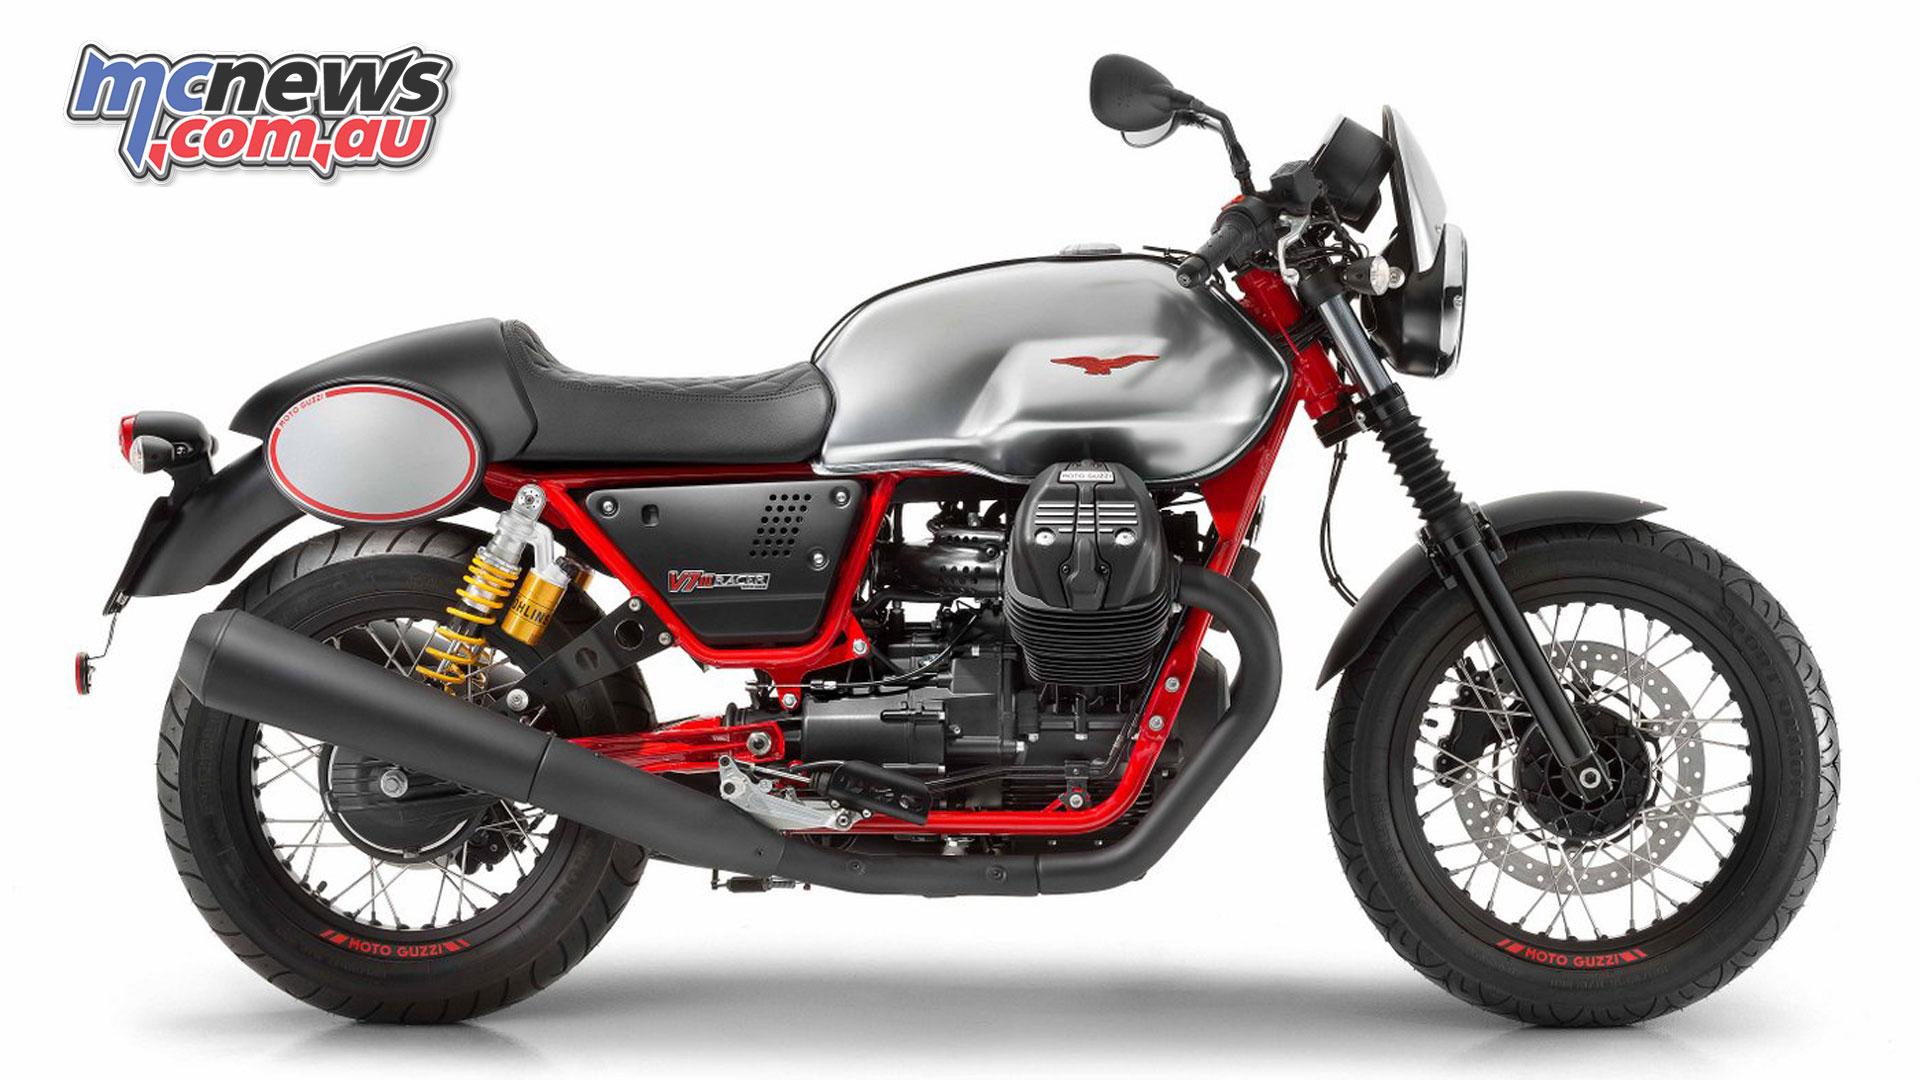 moto guzzi v7 iii racer review motorcycle tests mcnews. Black Bedroom Furniture Sets. Home Design Ideas